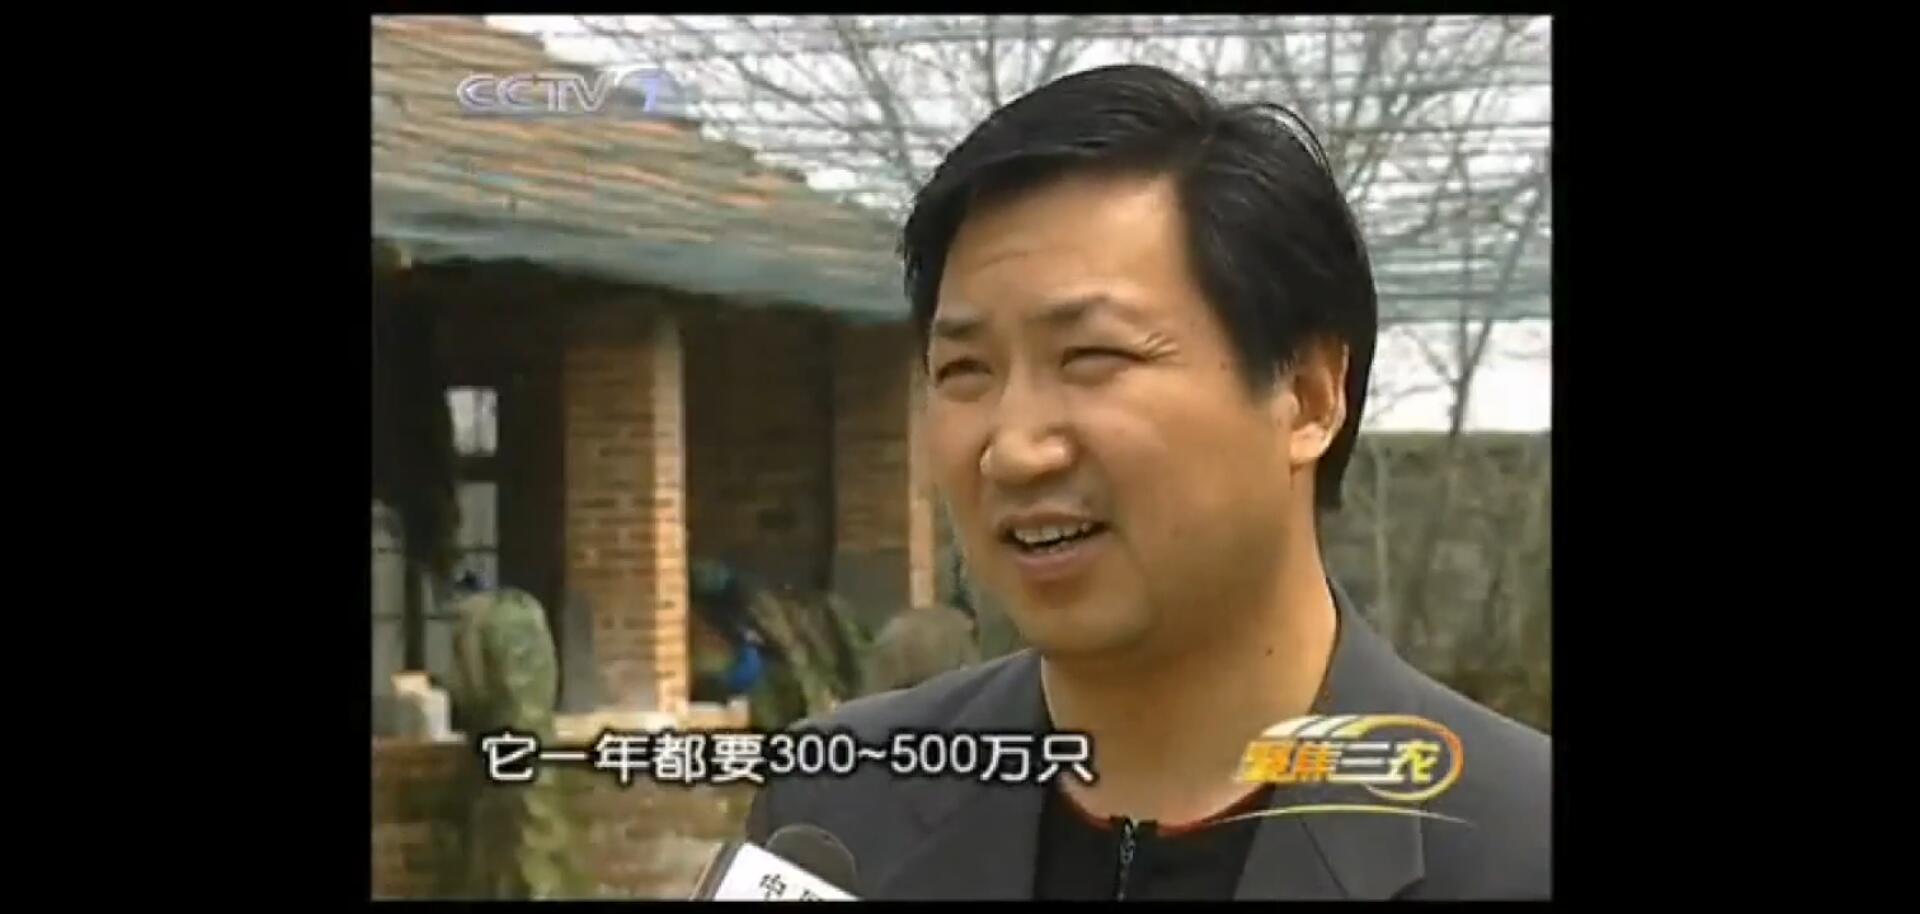 CCTV-7《聚焦三农》透视ballbet养殖业